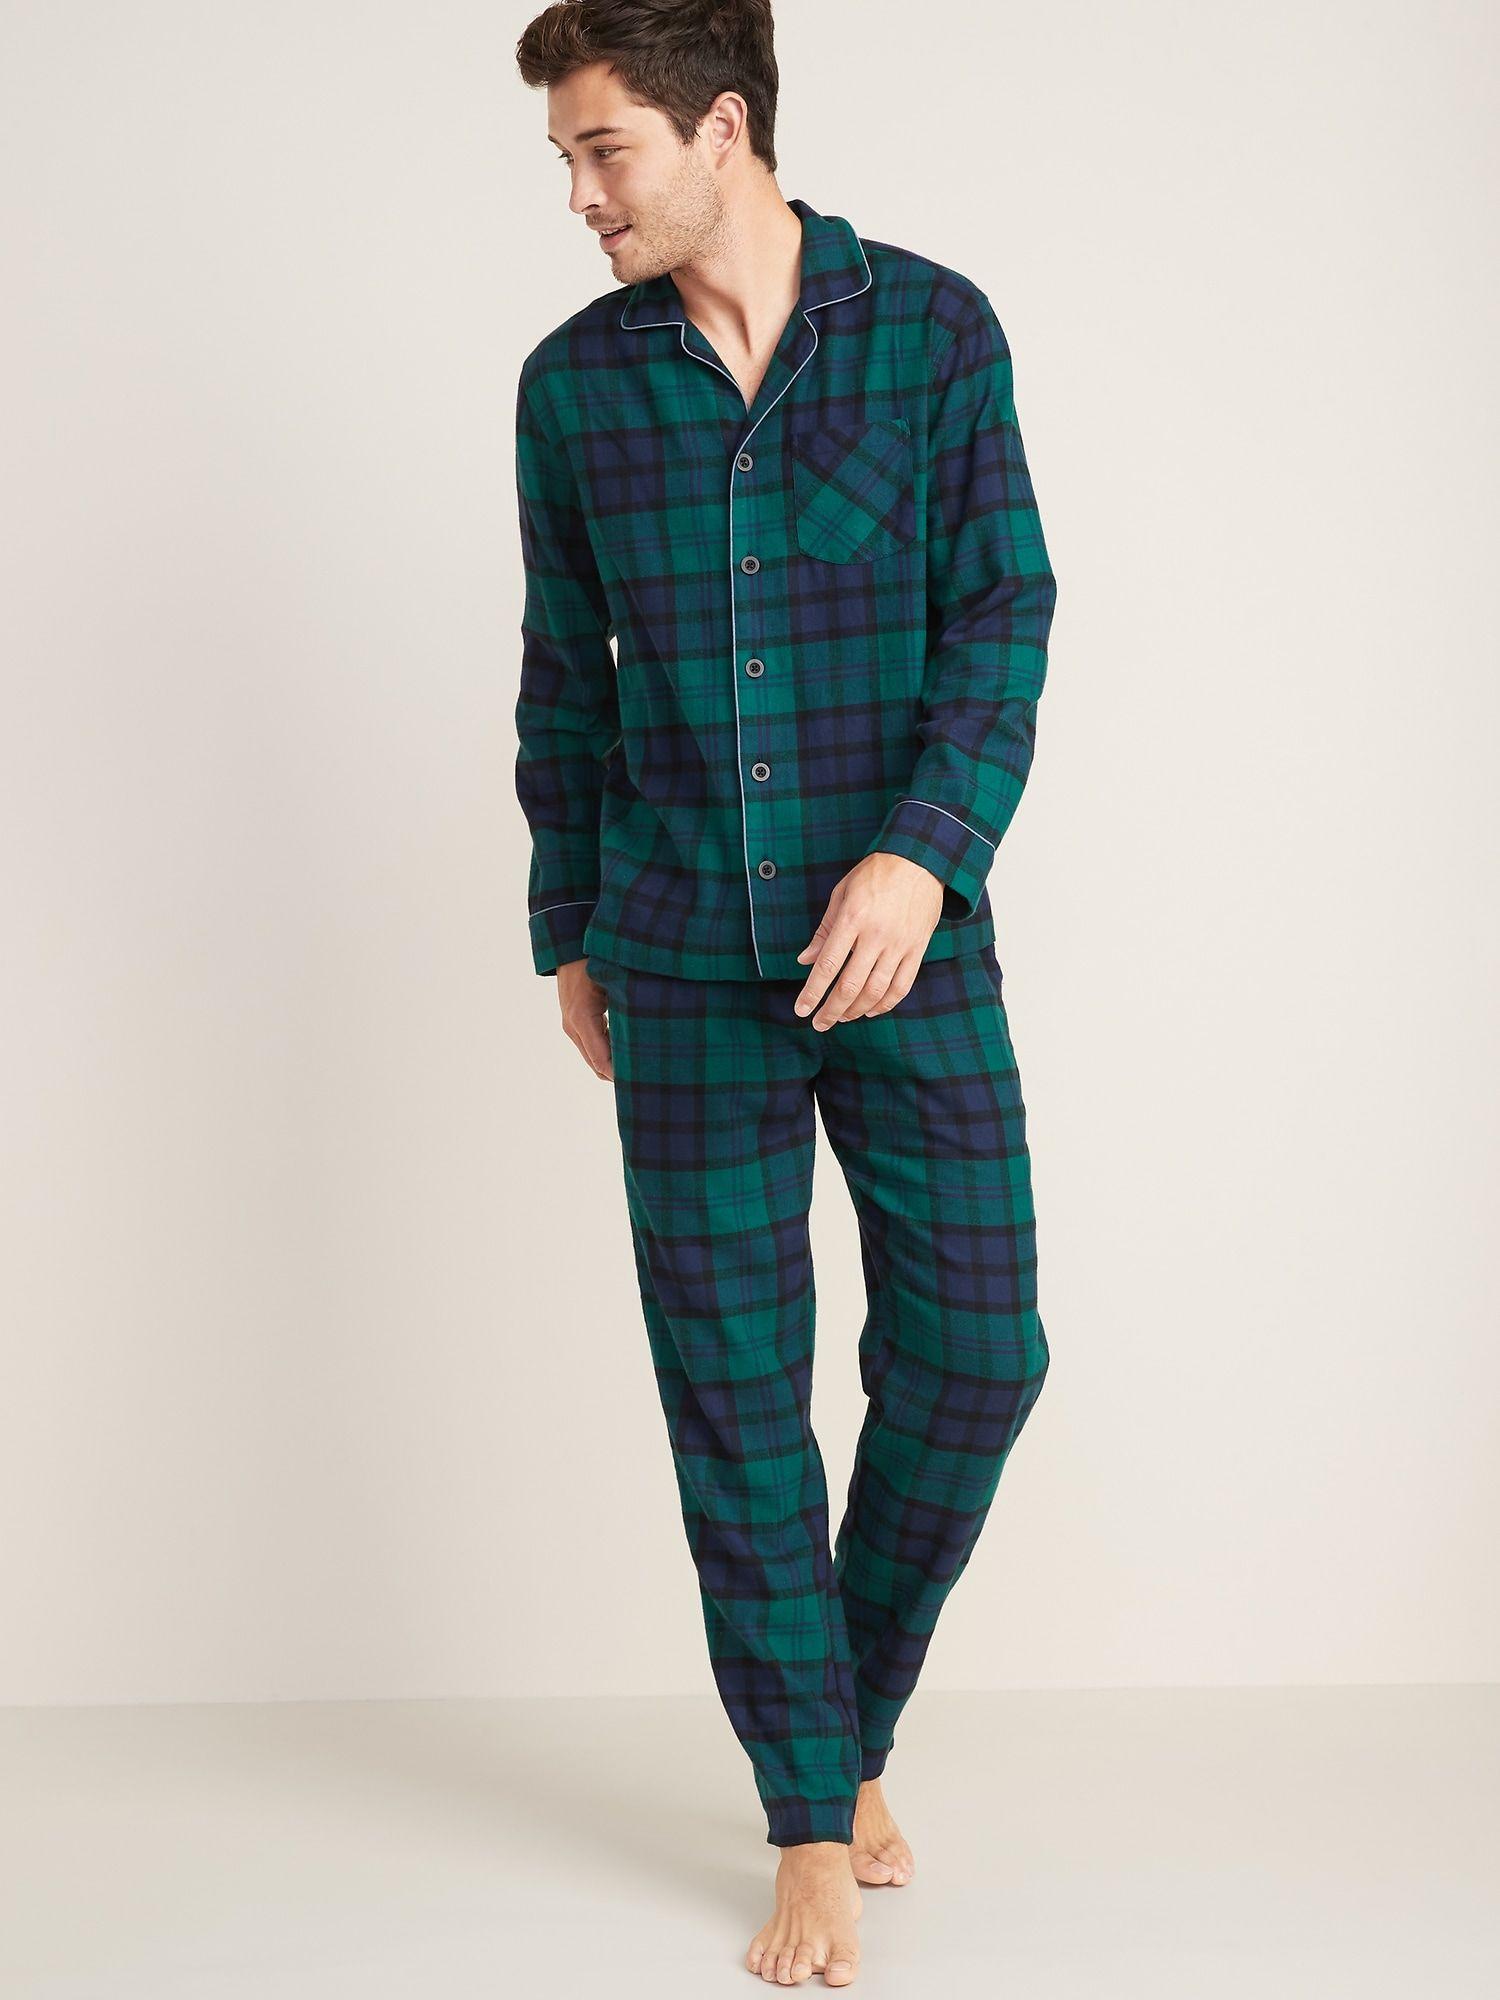 Patterned Flannel Pajama Set For Men Flannel pajamas